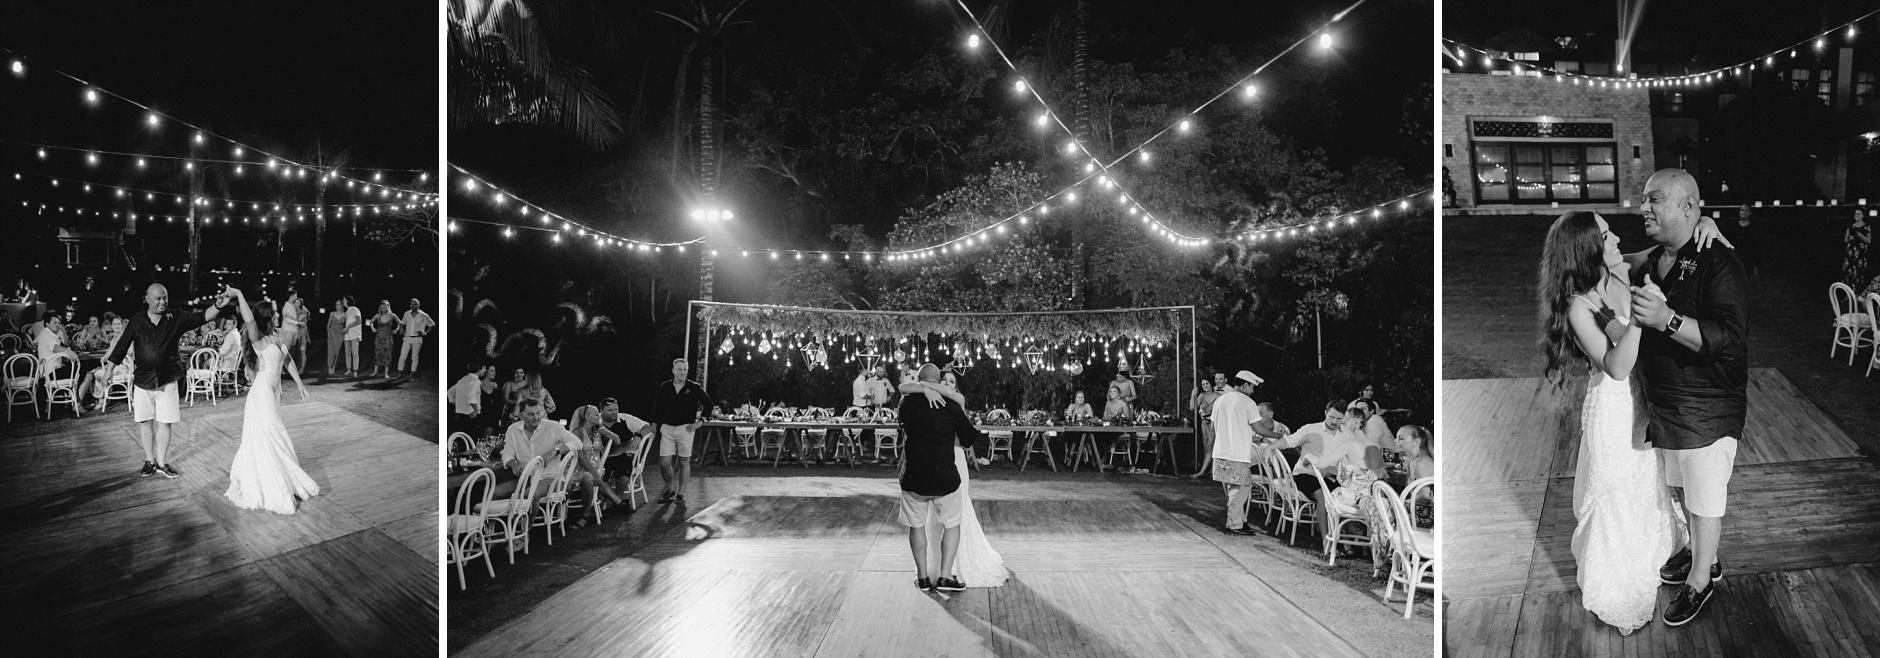 breanna&dan0725b_Bali-Wedding-Photographer.jpg